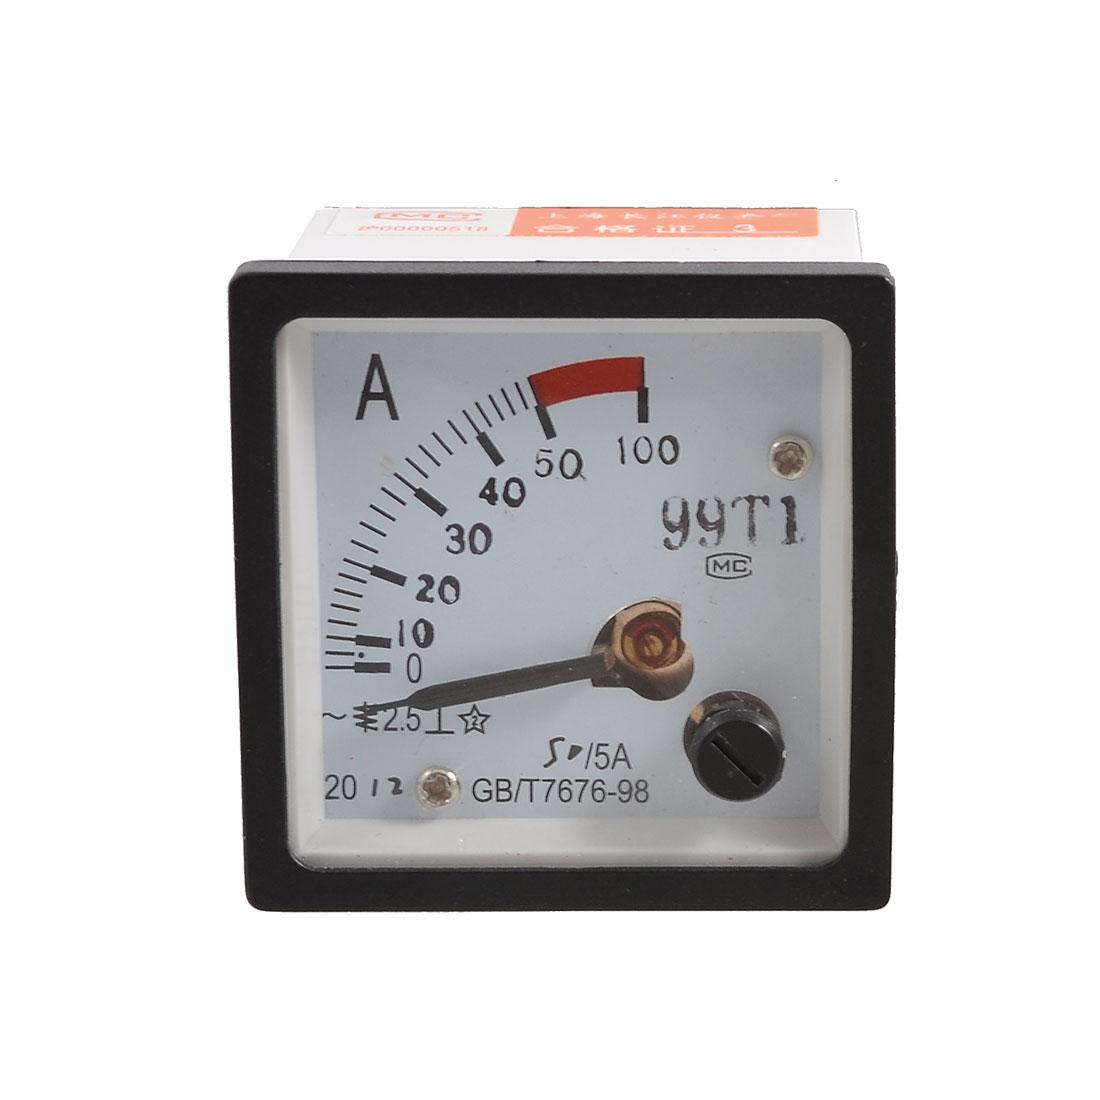 99T1 DC 0-50A 50/5 Amperemeter Analog Ammeter Panel Meter